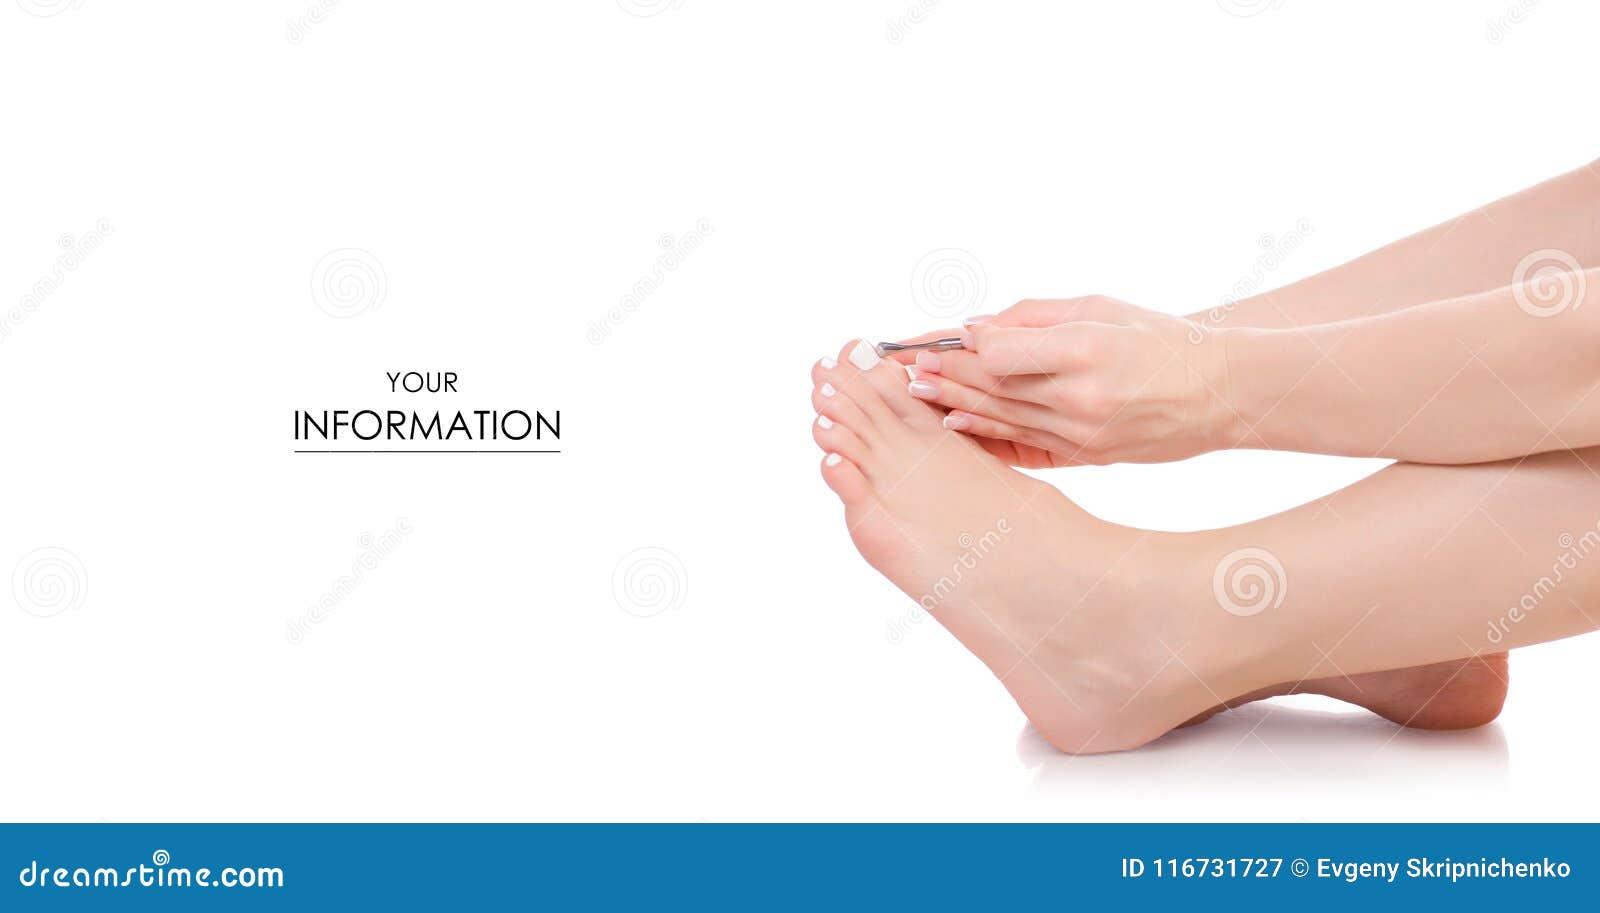 Female Feet Legs Pusher For Nails In Hands Pedicure Beauty Pattern ...